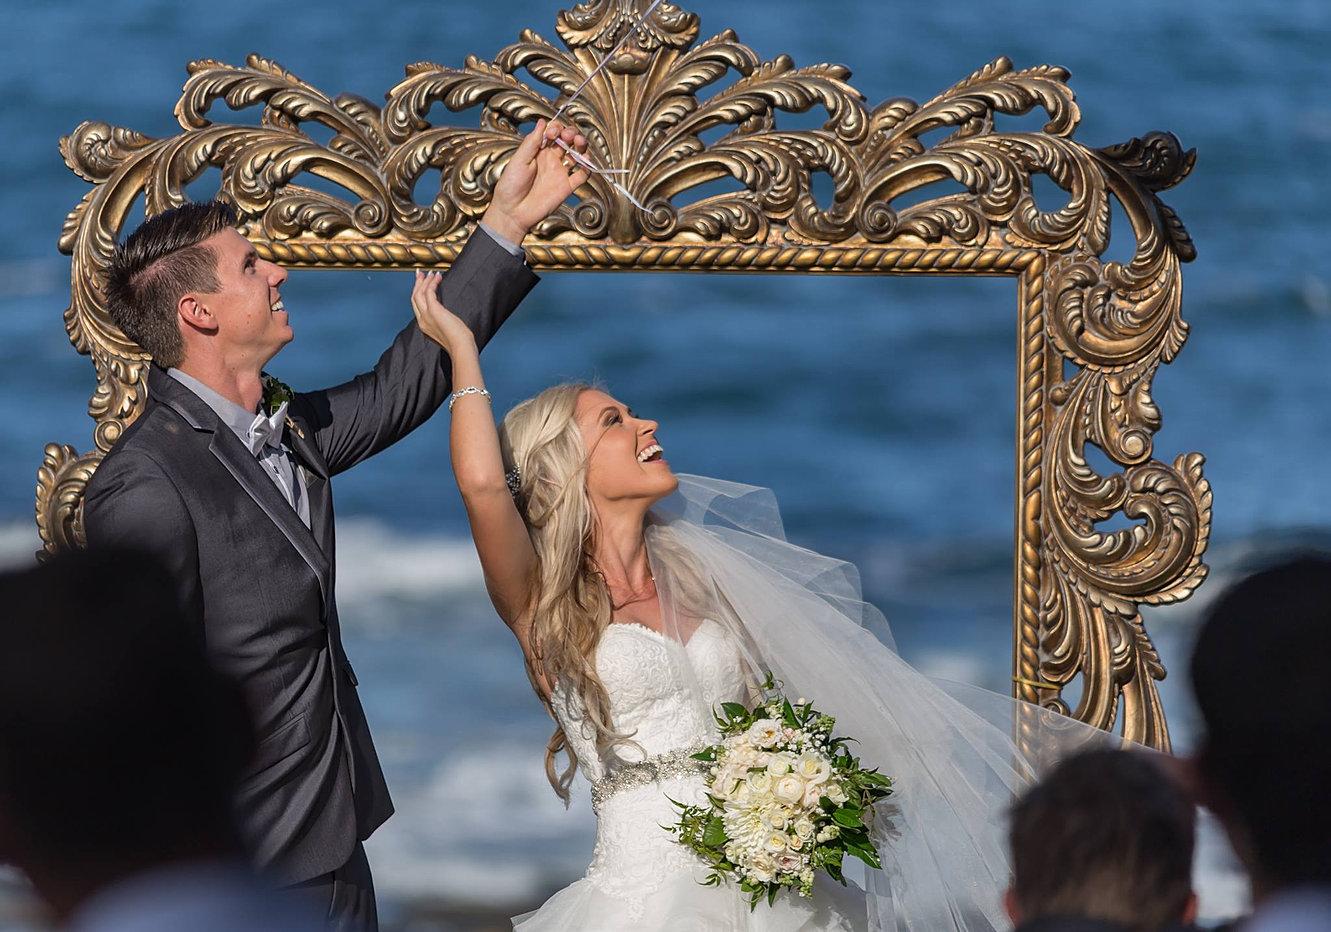 Wedding styling queensland dream wedding ceremonies hannah frame balloon release junglespirit Choice Image